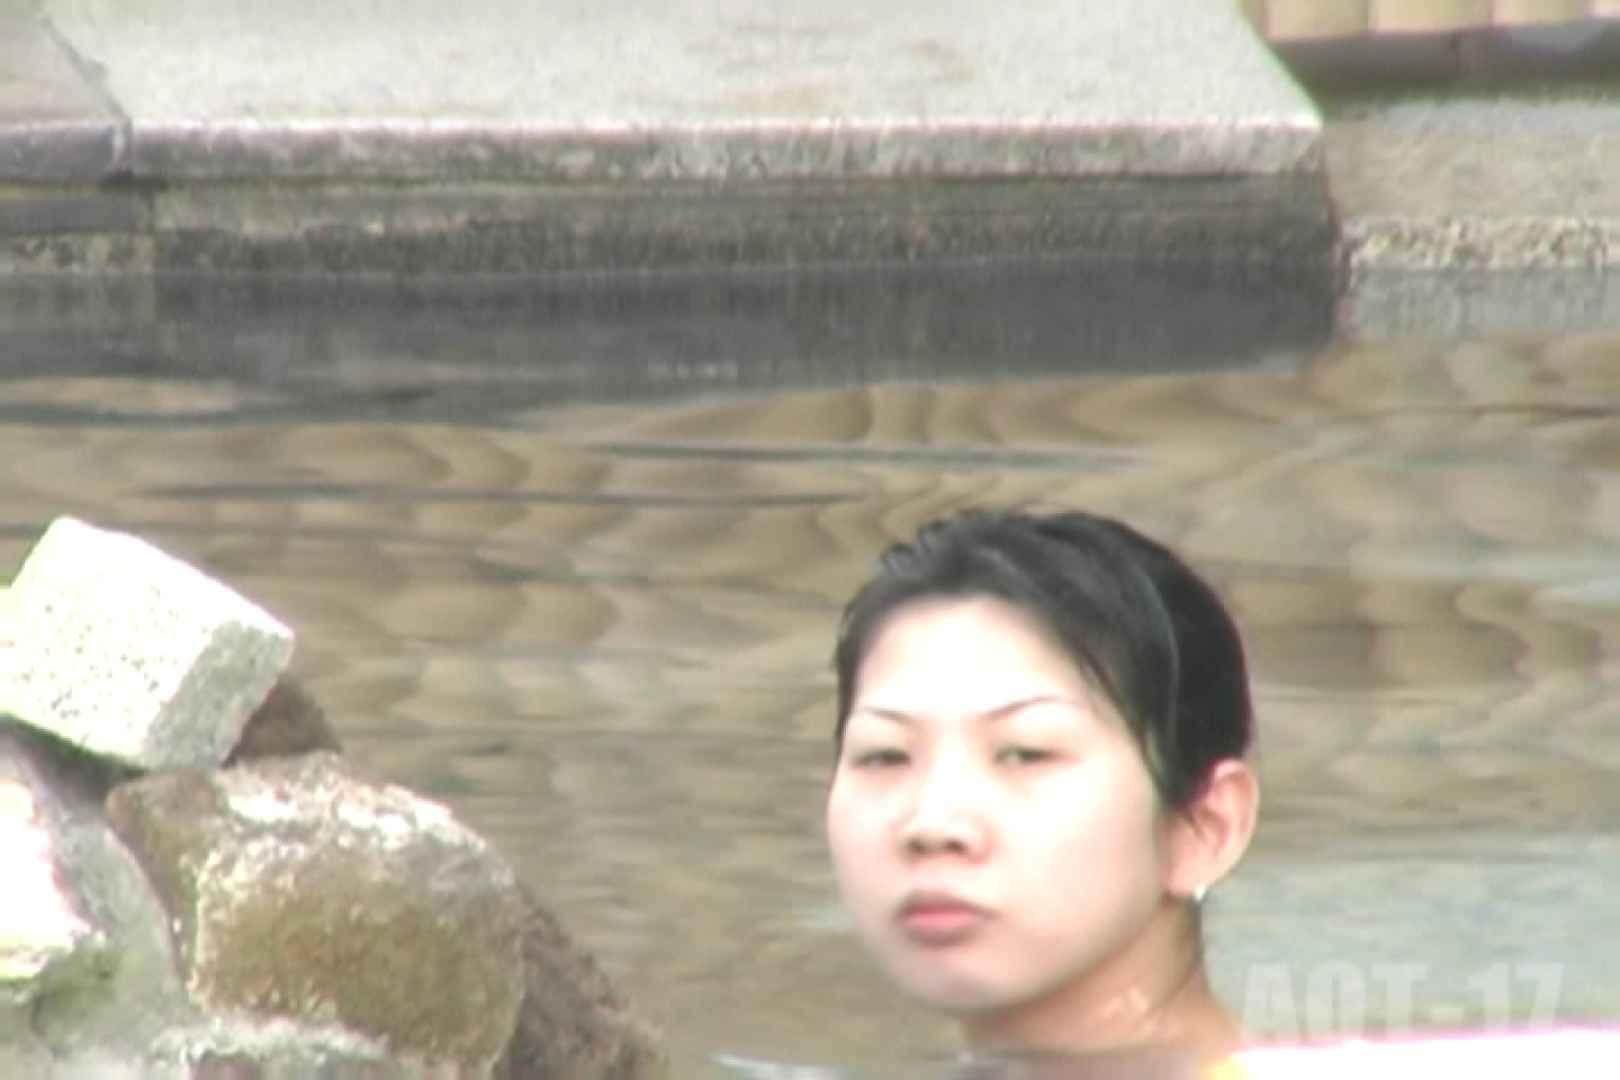 Aquaな露天風呂Vol.850 盗撮シリーズ | 露天風呂編  88PIX 55